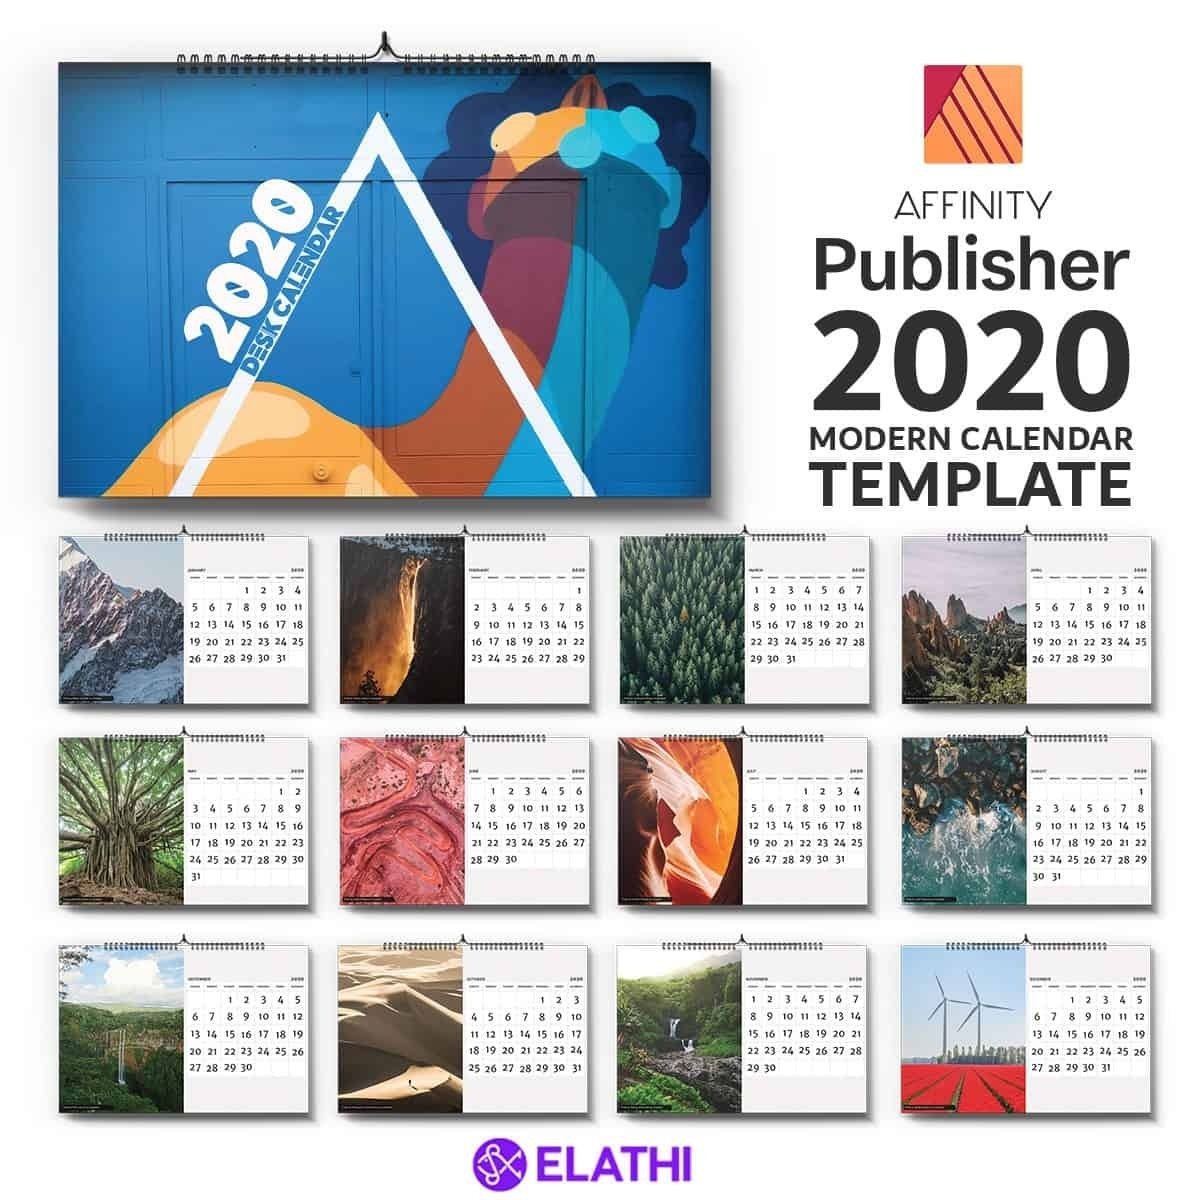 Download : 2020 Calendar Template (Affinity Publisher Calendar Template Graphic Design